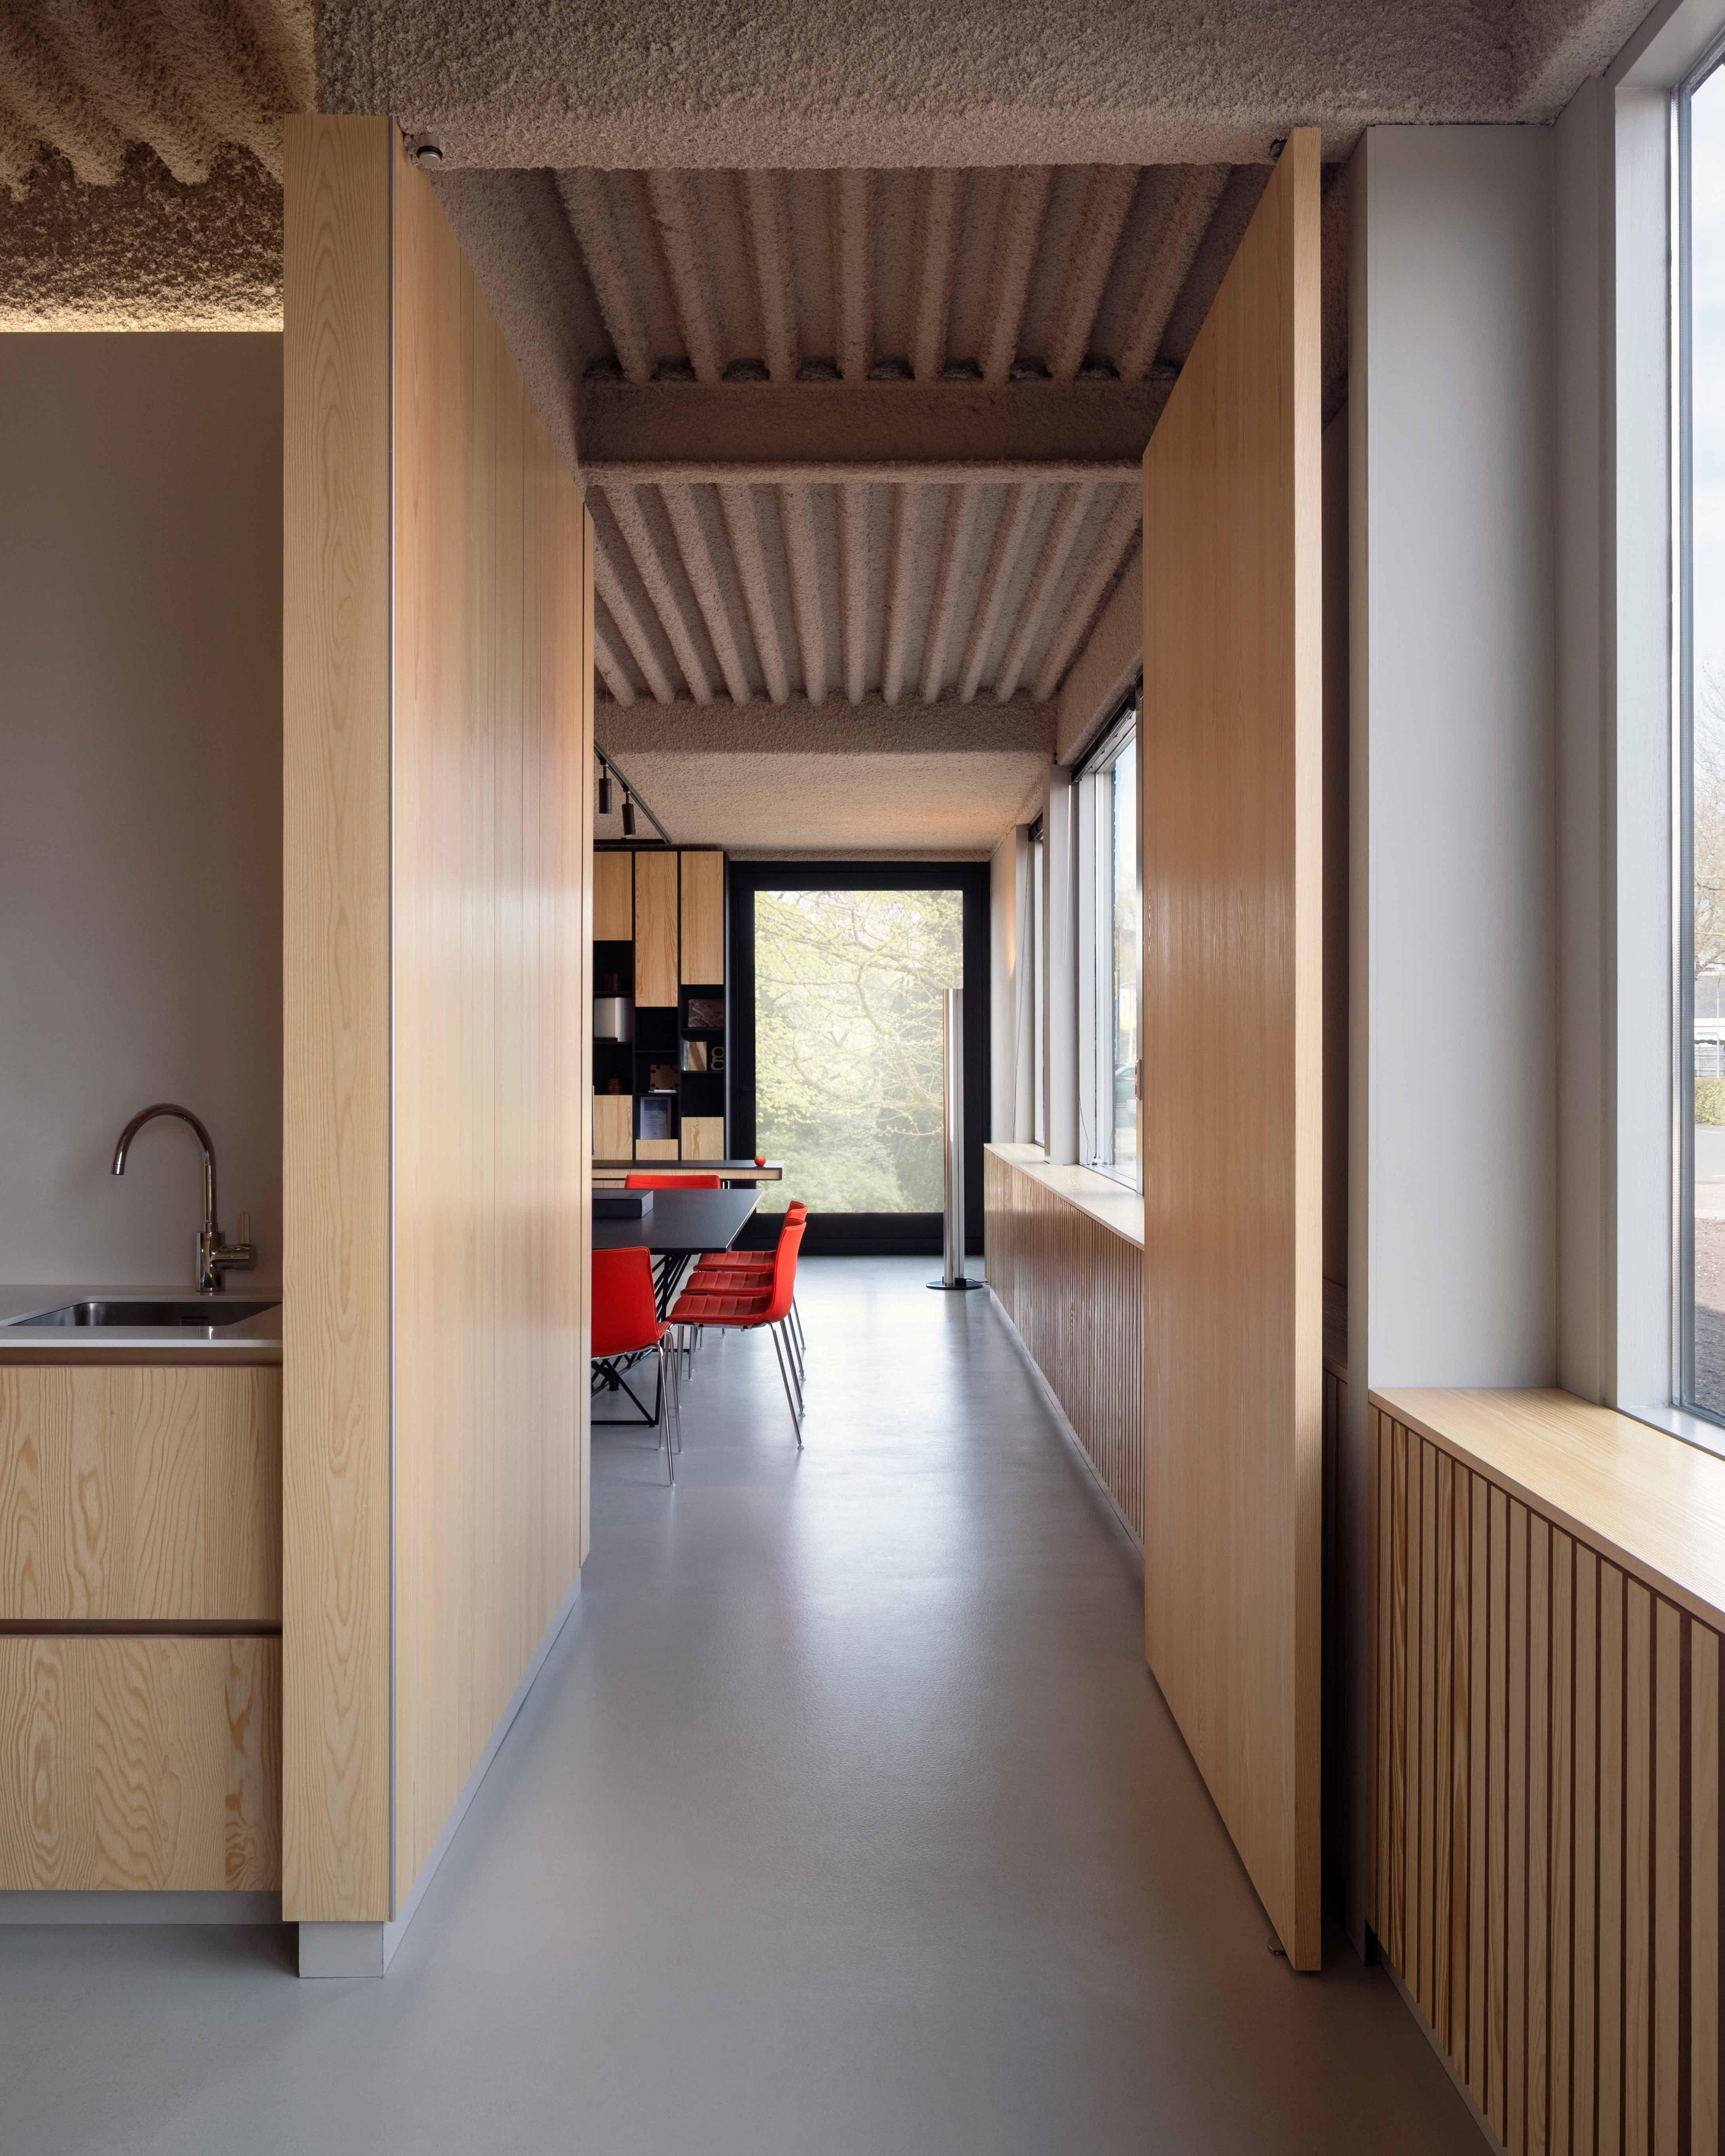 Wooden pivot doors - Invisible pivot hinges by FritsJurgens